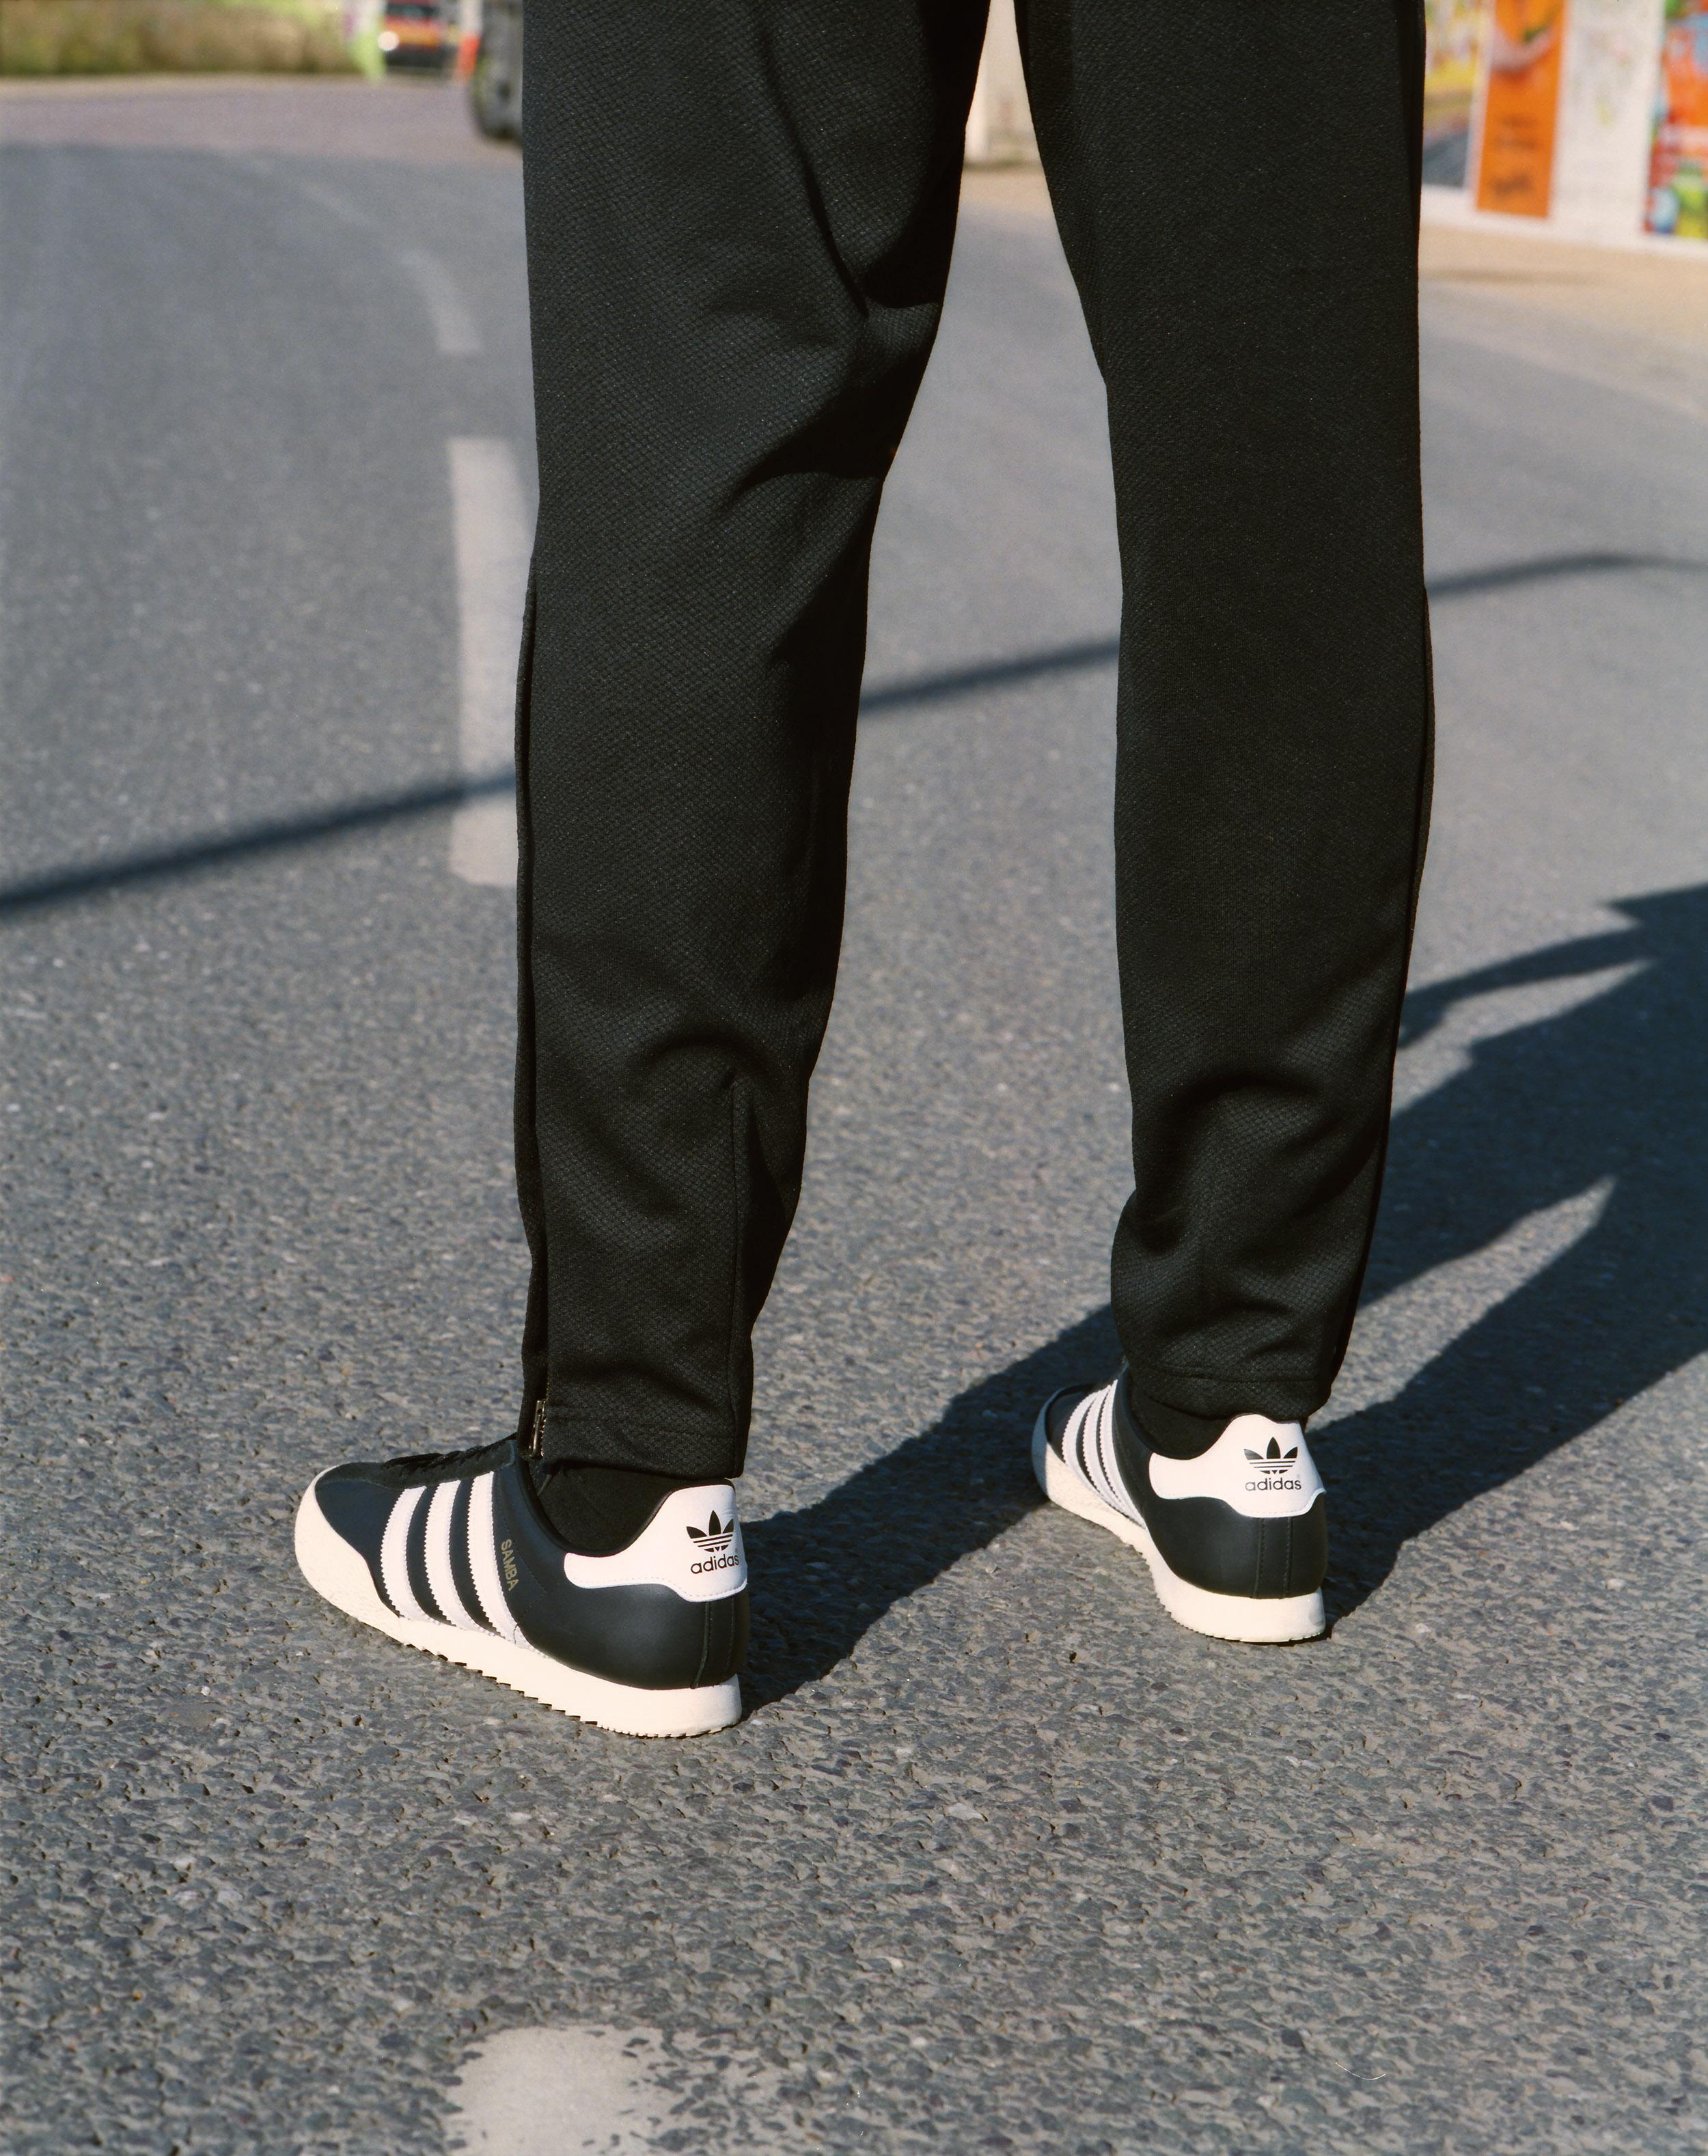 adidas_spezial_samba_5